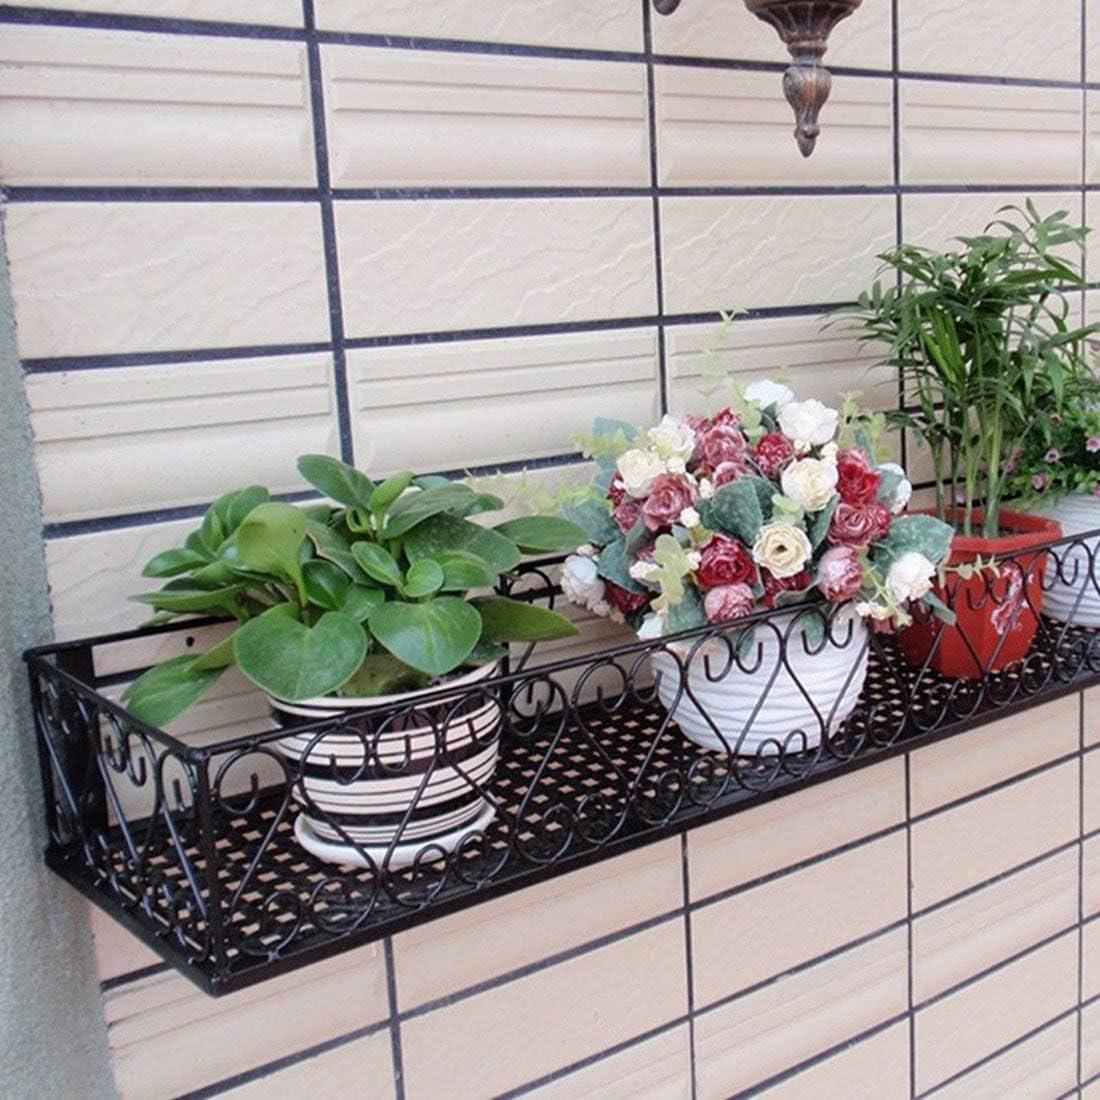 Latest item LLYU European-Style Balcony Wrought Some reservation Iron Flower Ha Stand Railing